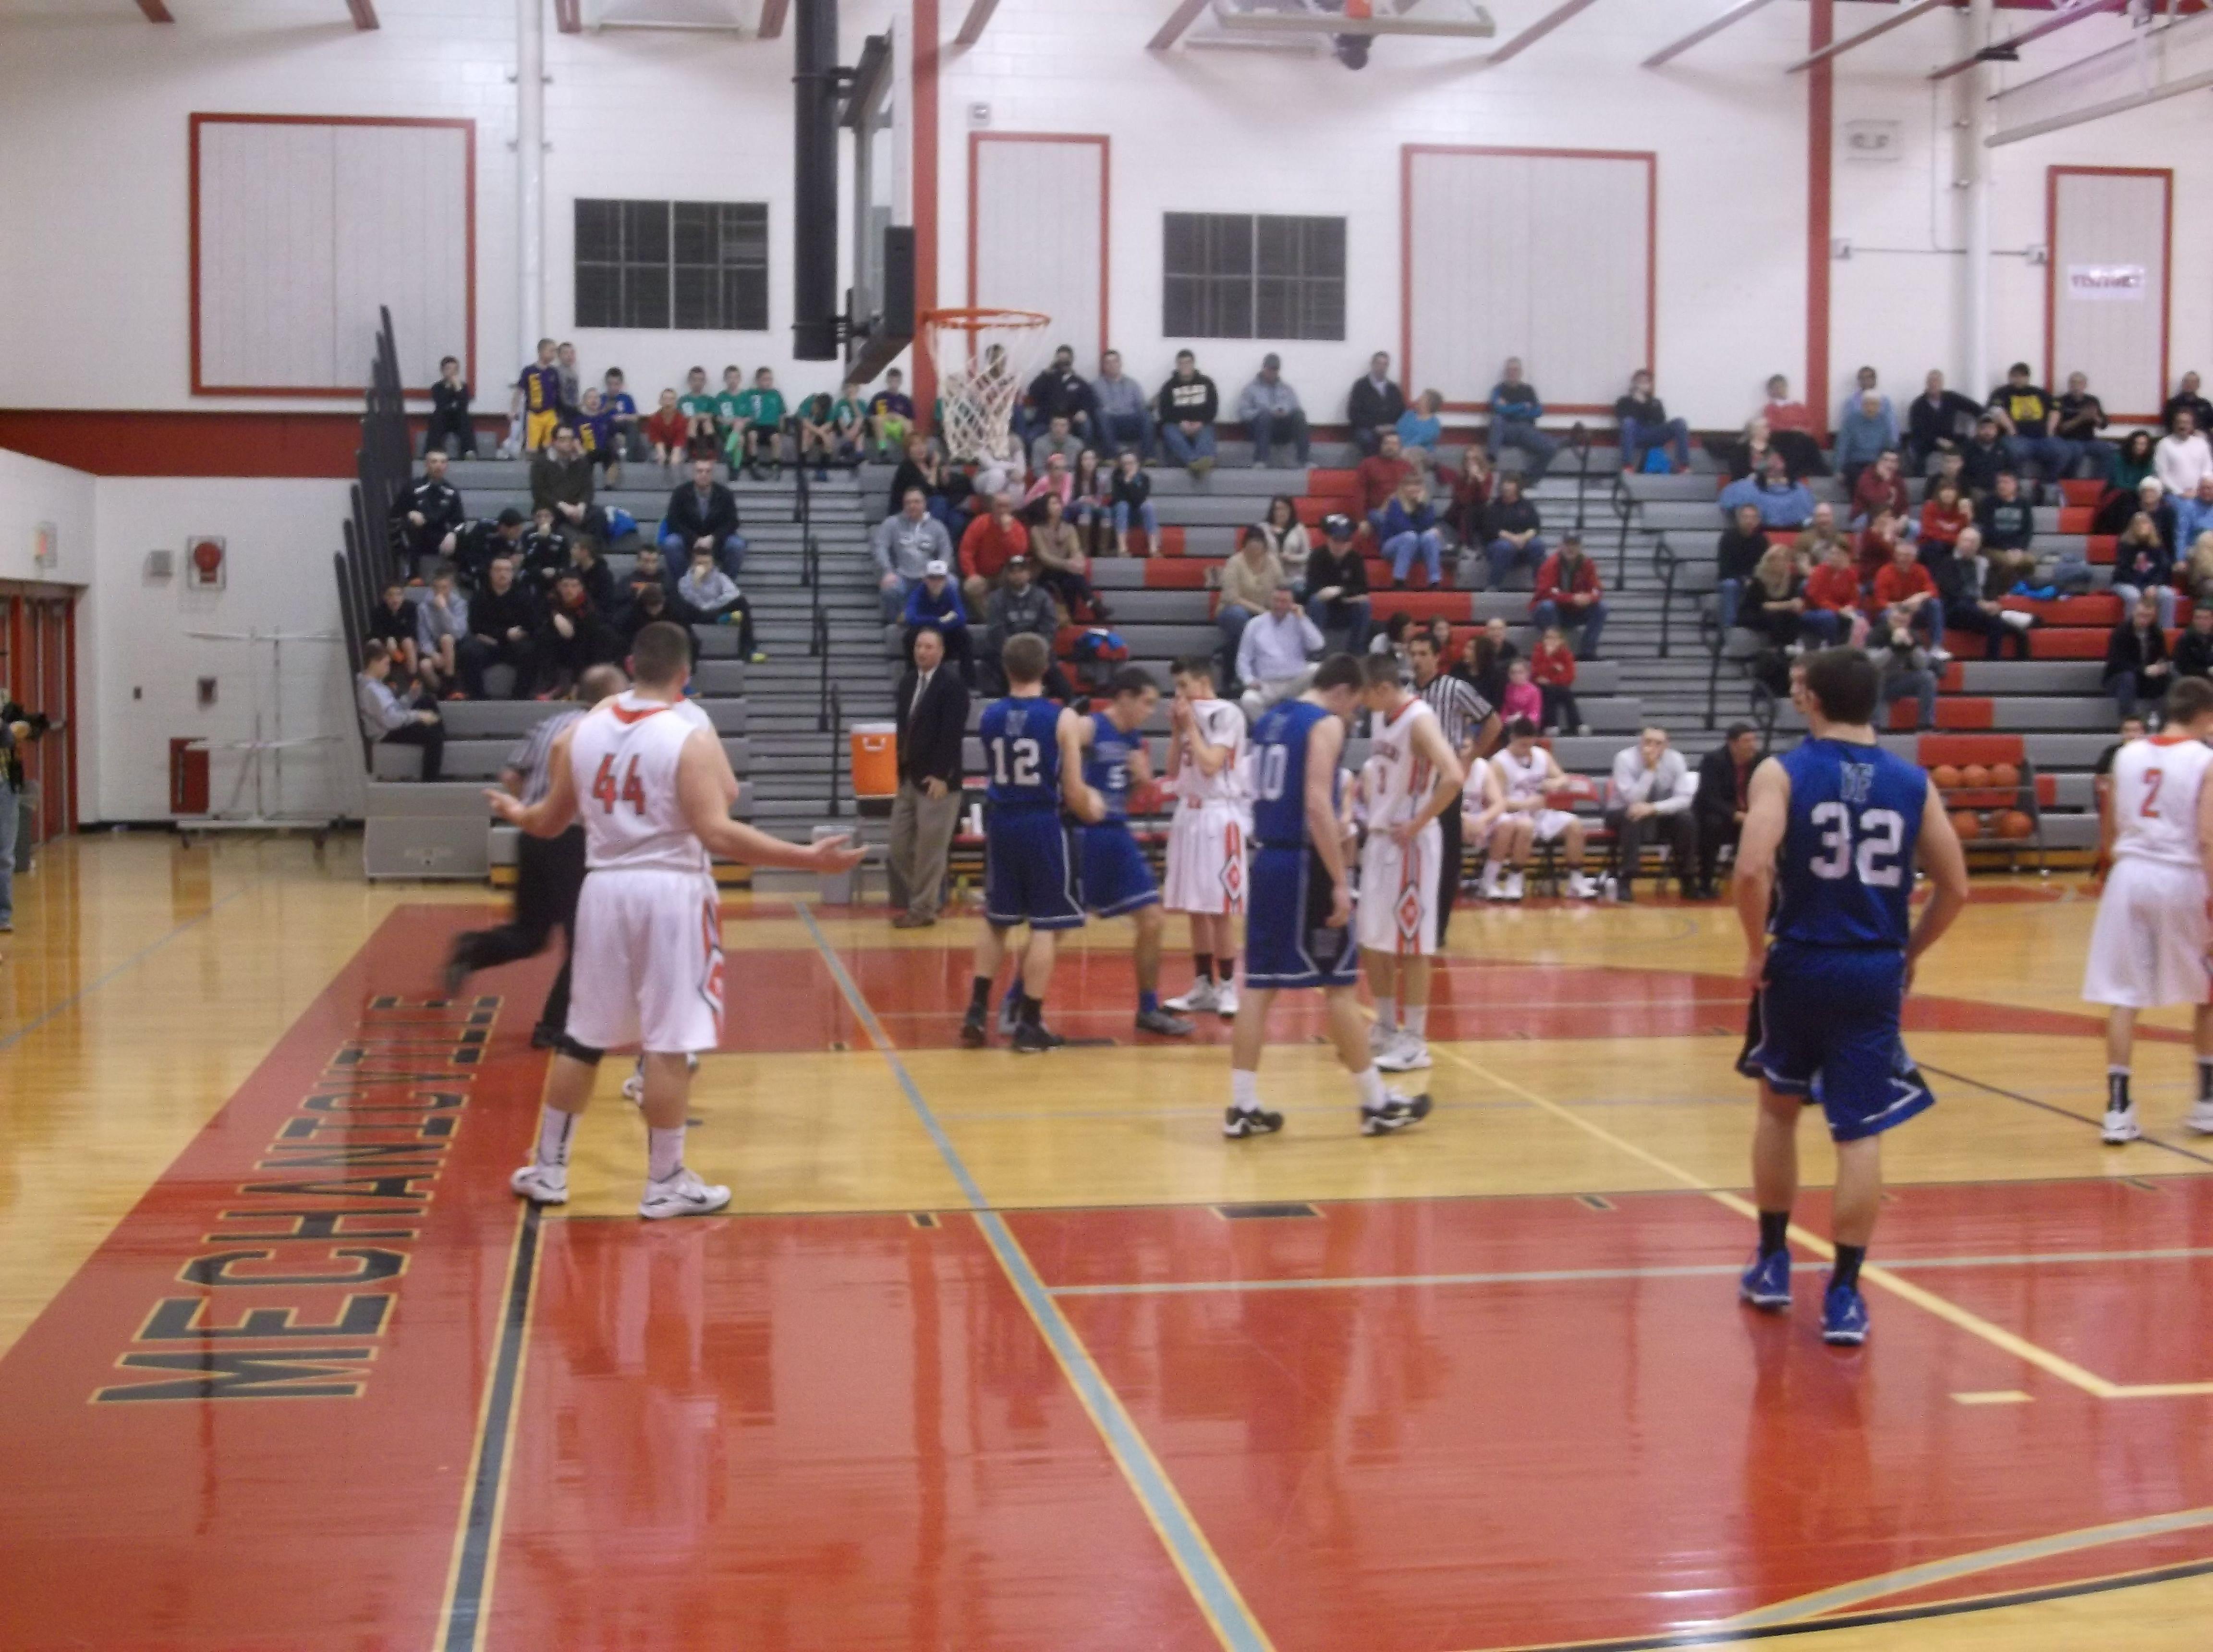 1 26-2015 Mechanicville vs Husic Valley Basketball